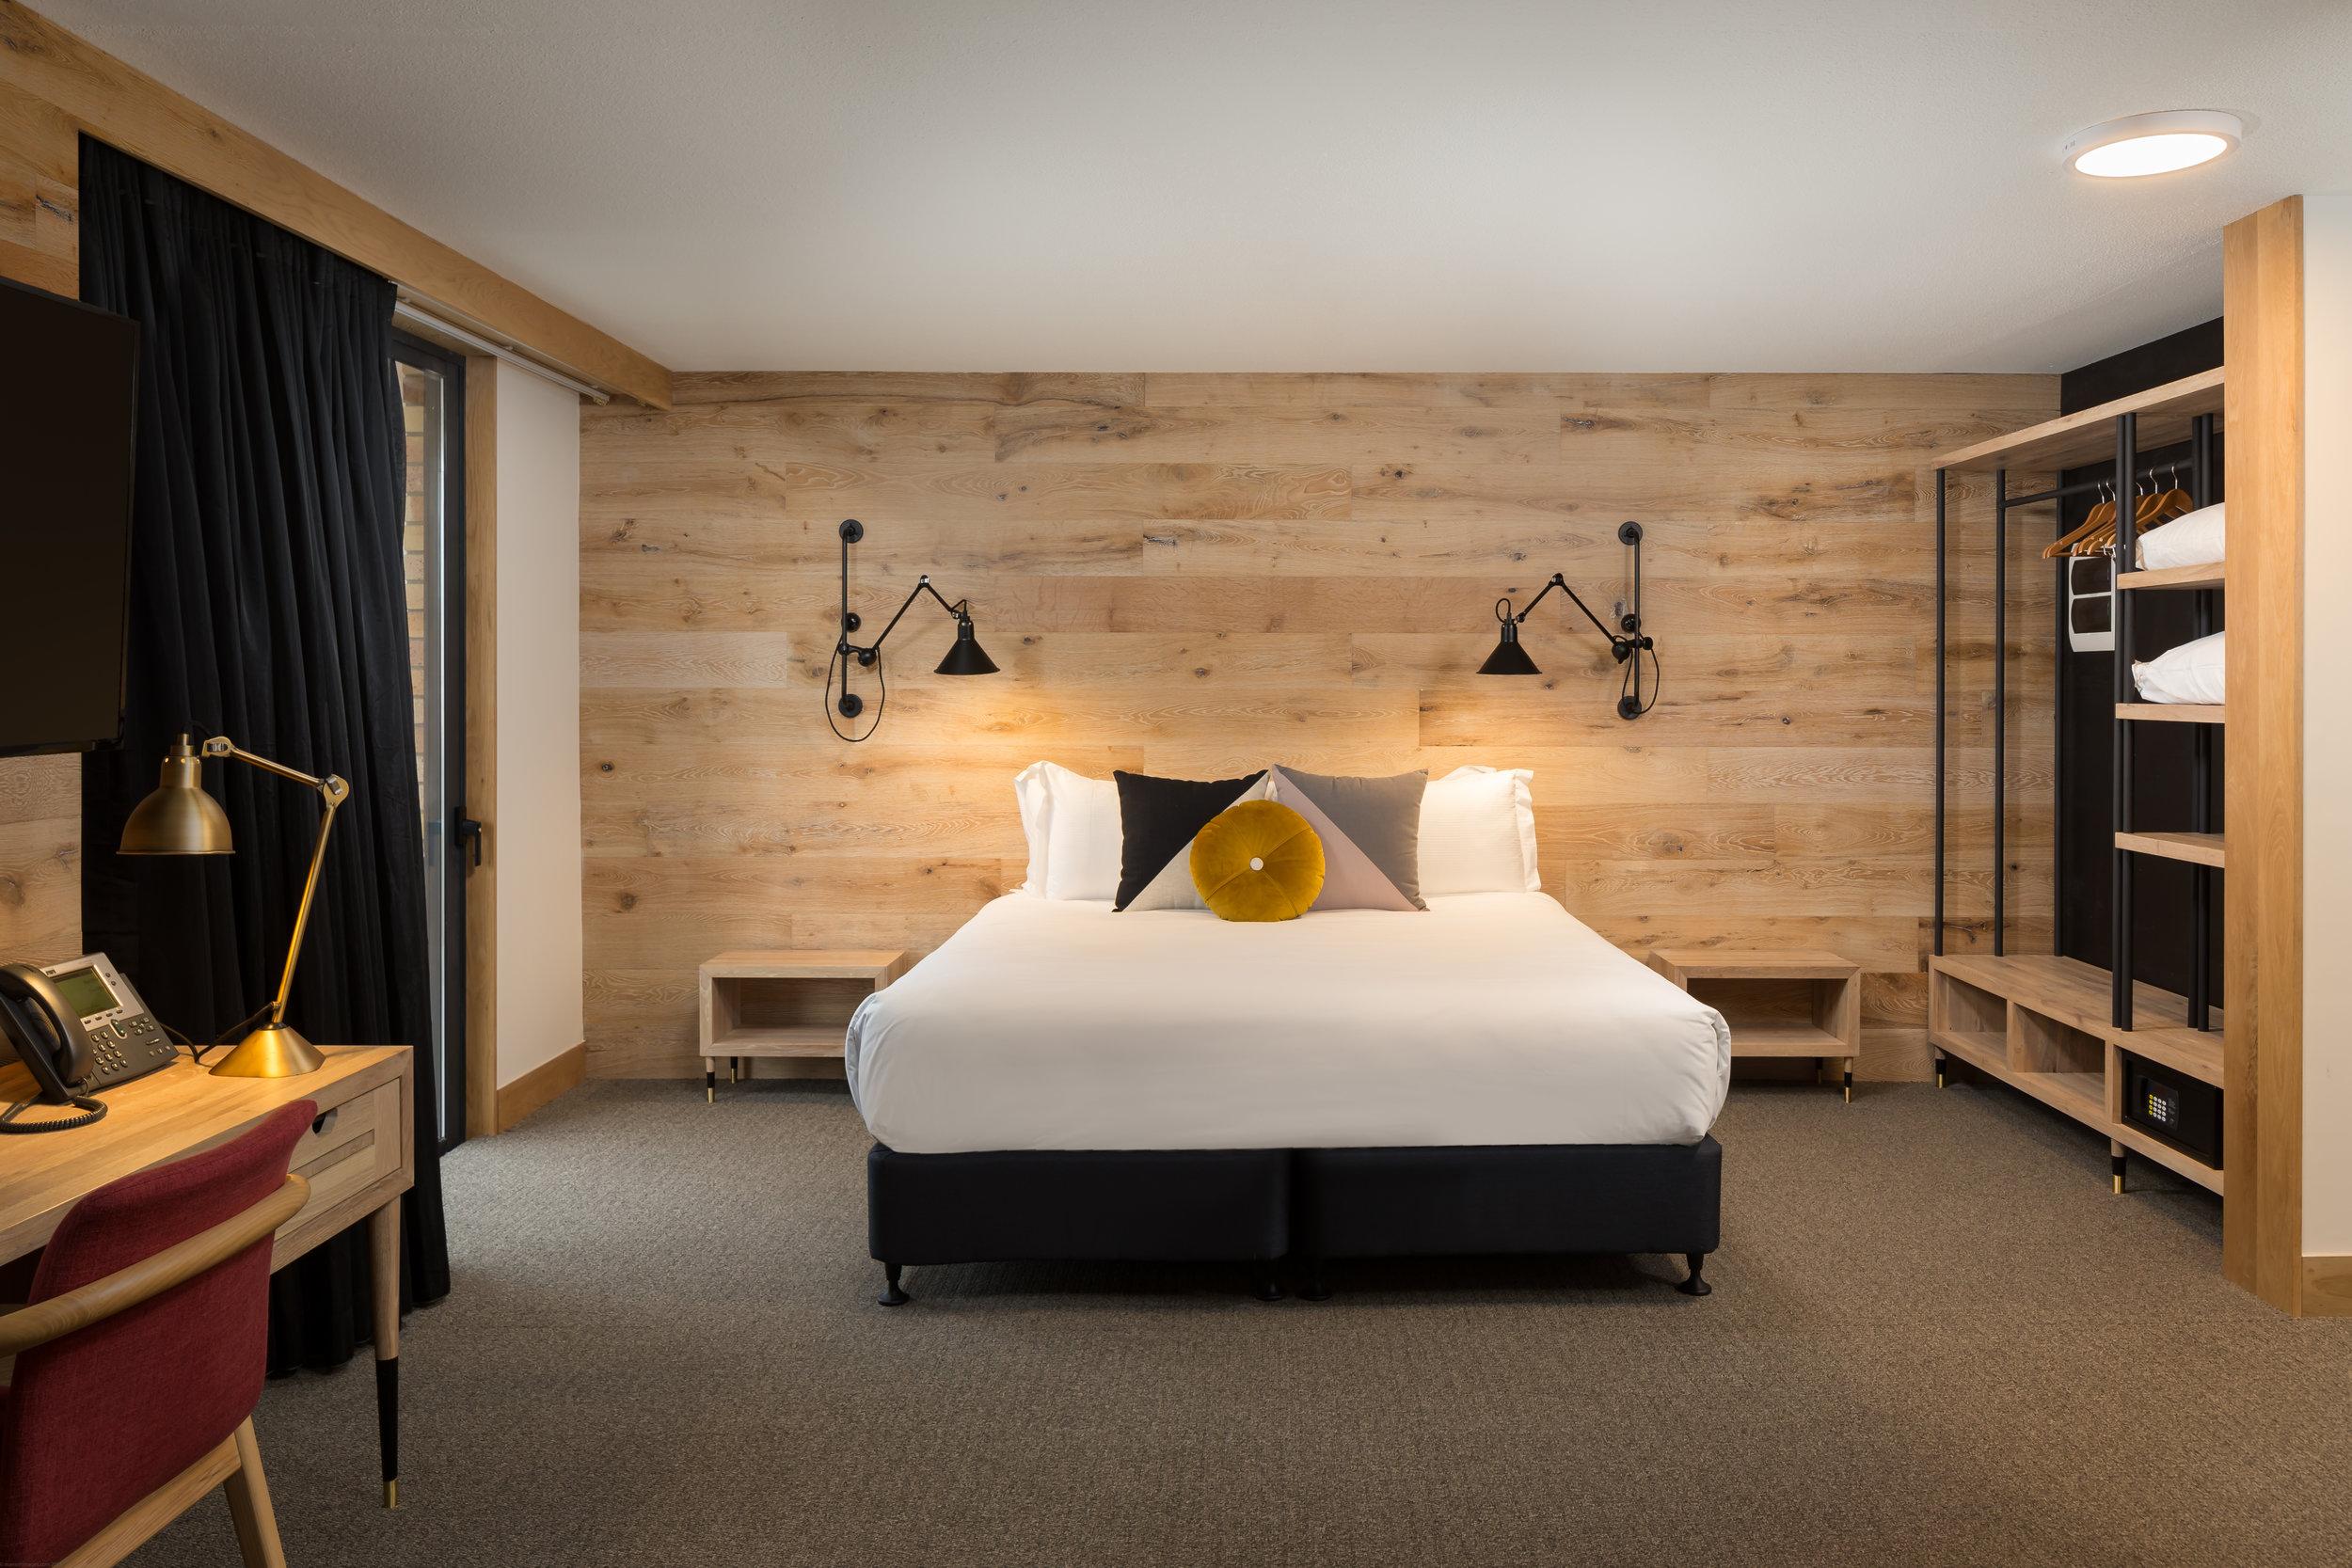 The Island_Boutique Hotel Suites